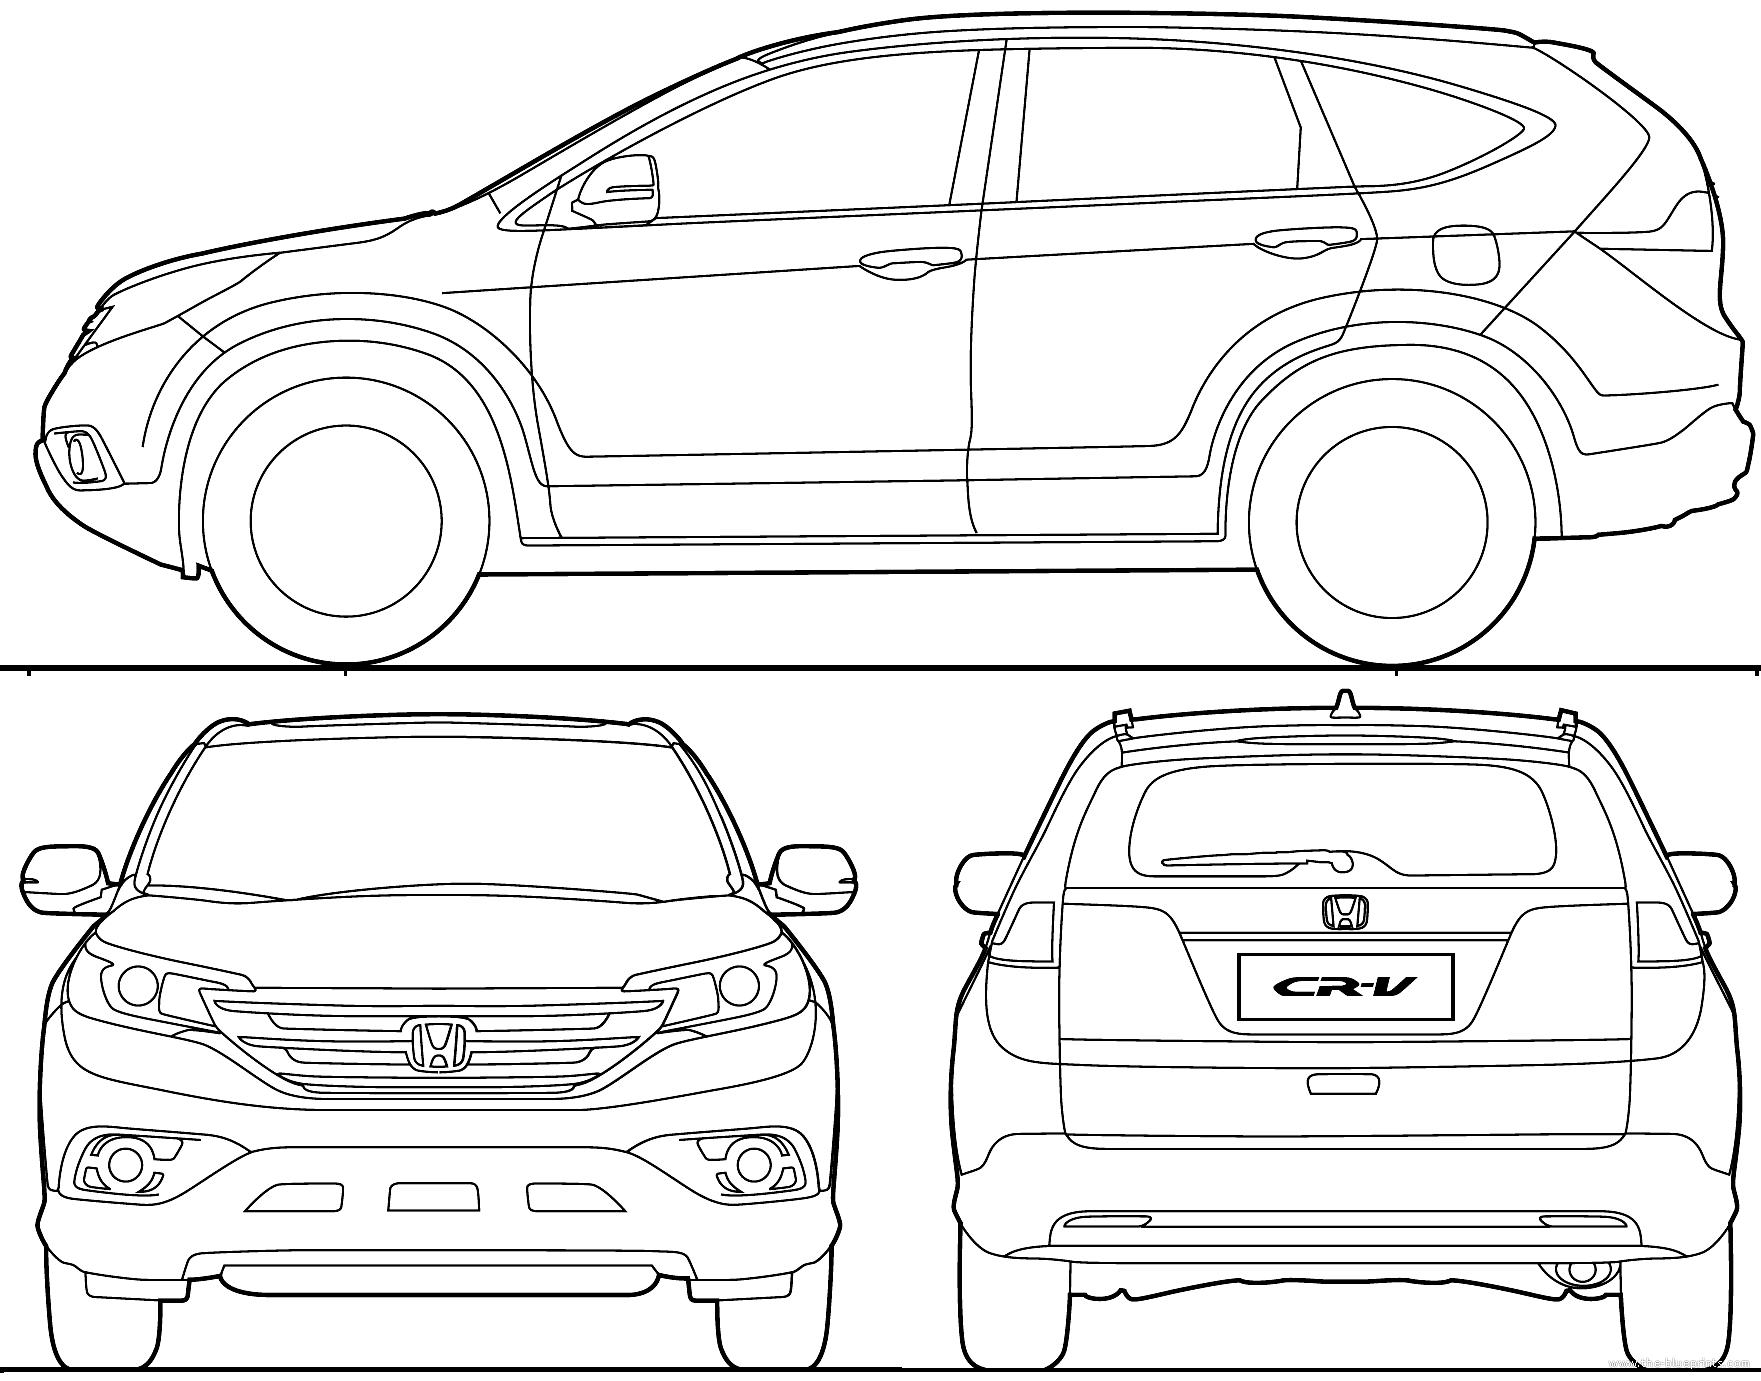 The-Blueprints.com - Blueprints > Cars > Honda > Honda CR ...